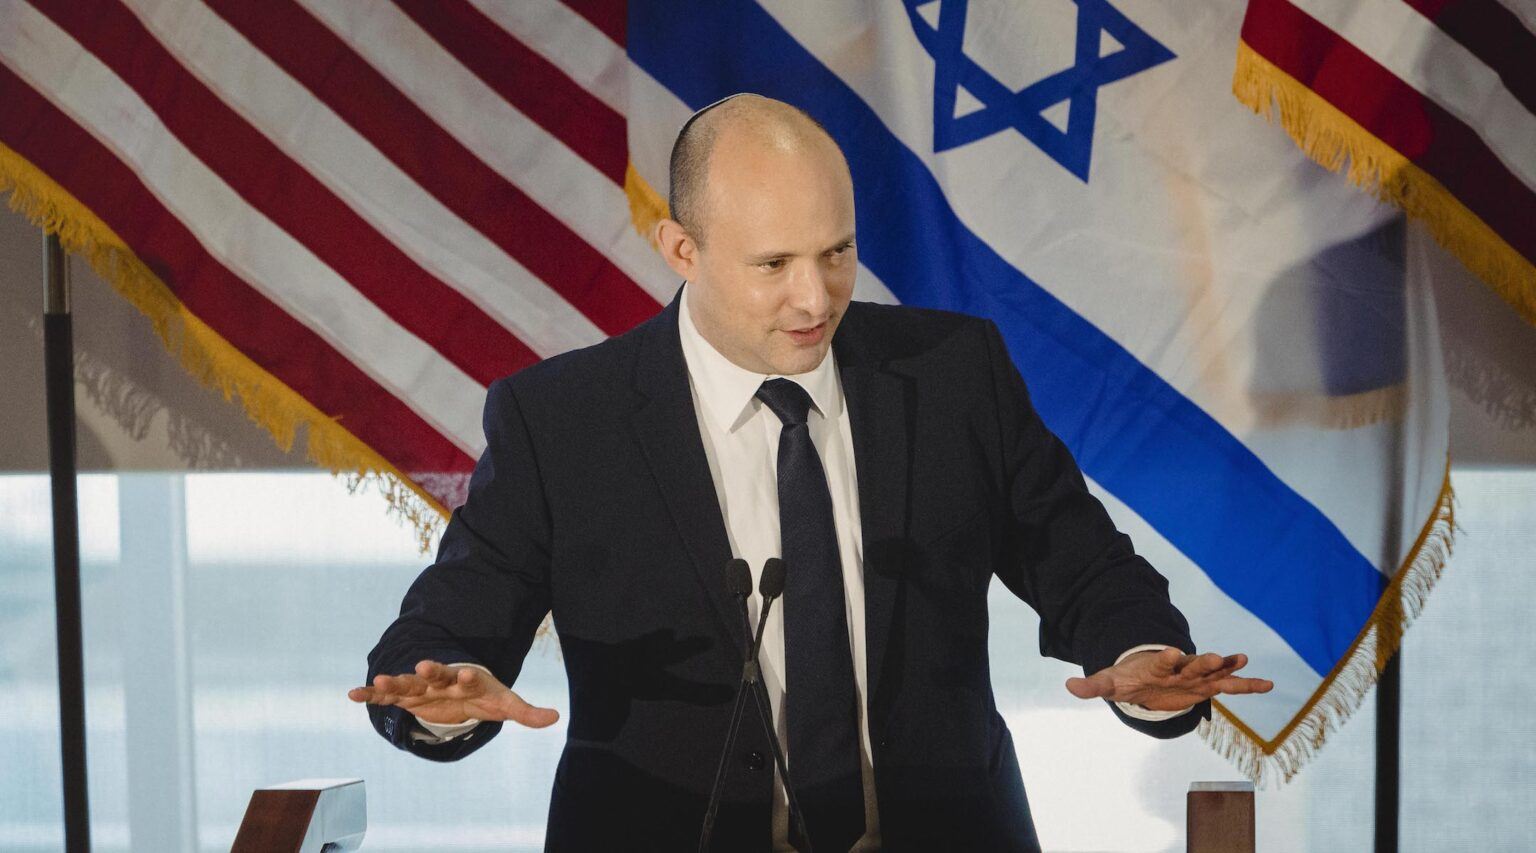 Israeli Prime Minister Naftali Bennett speaks to American Jewish leaders in New York City on Sept. 27, 2021. (Photo/JTA-Courtesy JFNA-Sara Naomi Lewkowicz)